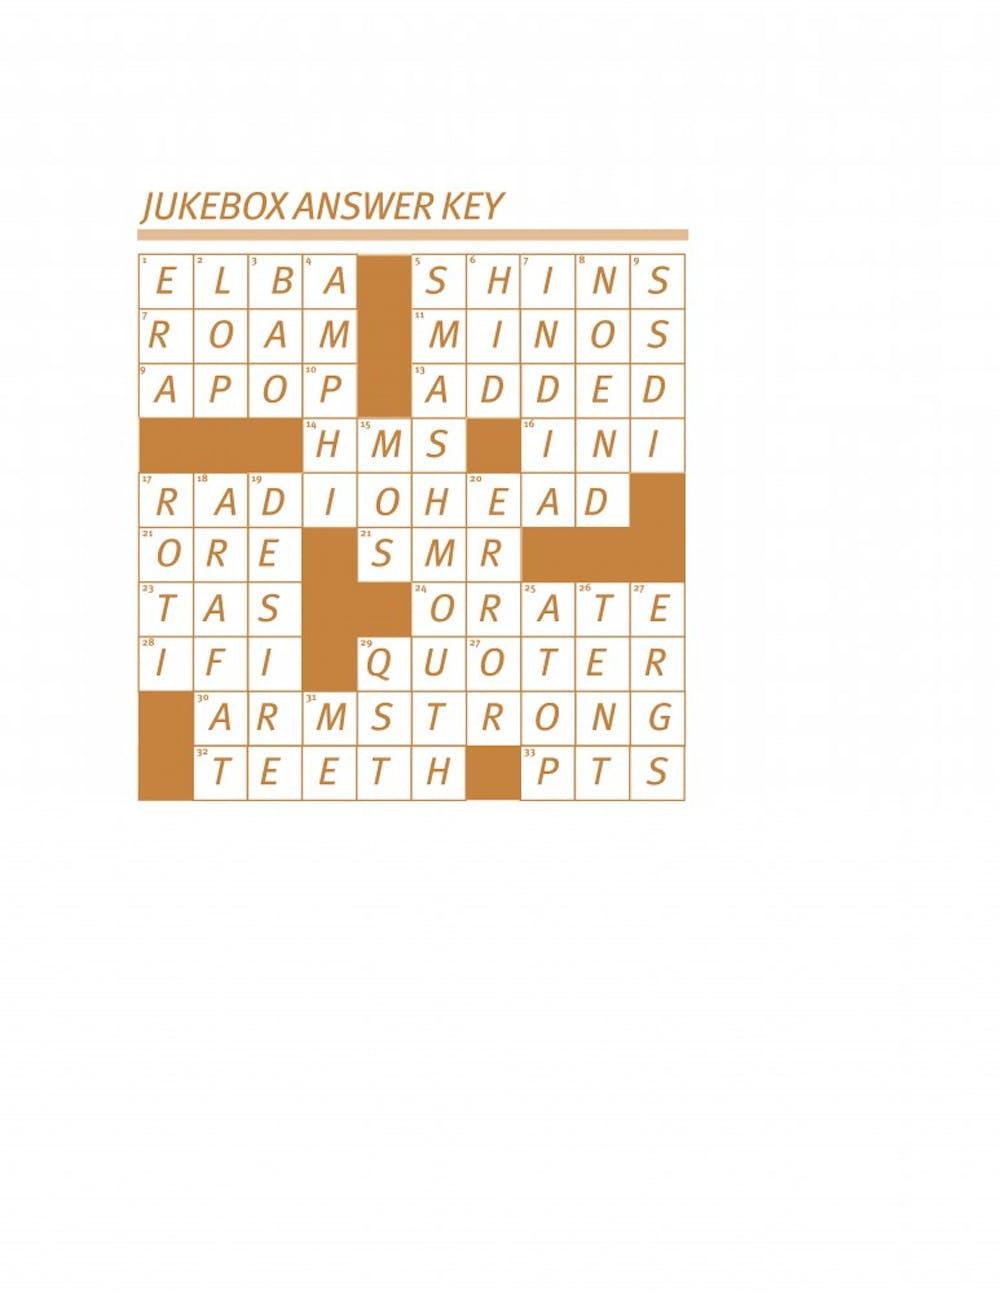 crossword9_answerkey